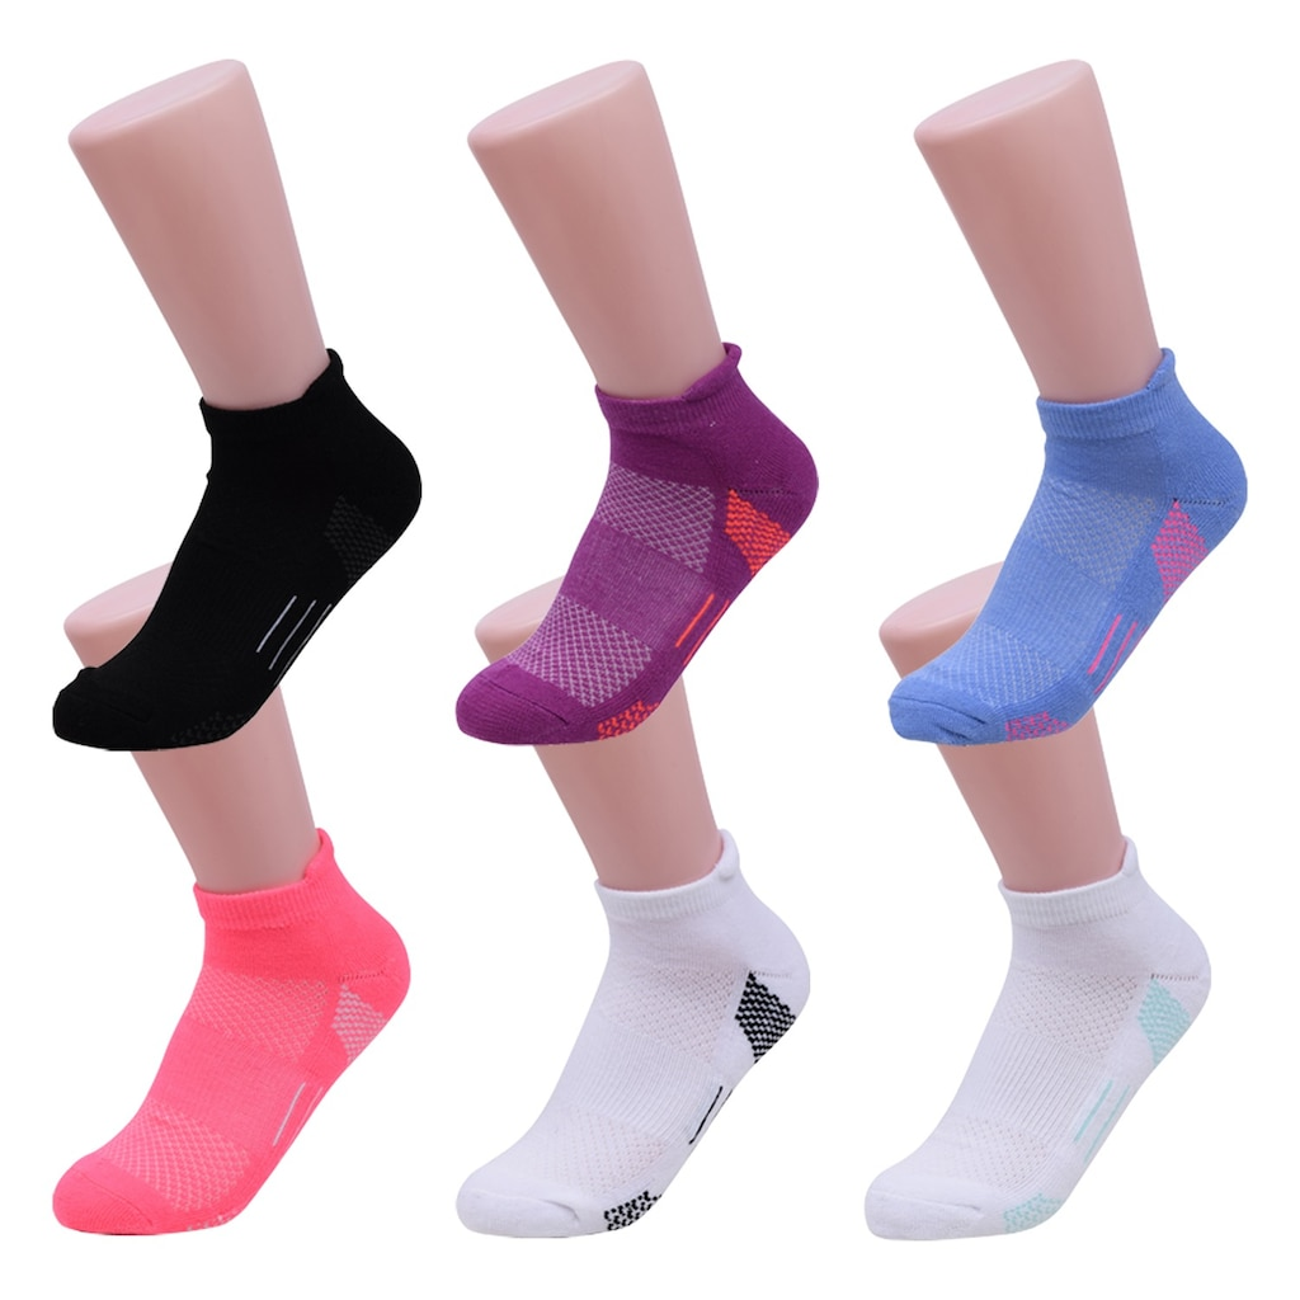 6b94392064b Women s Size 5-9 Low-Cut Performance Socks